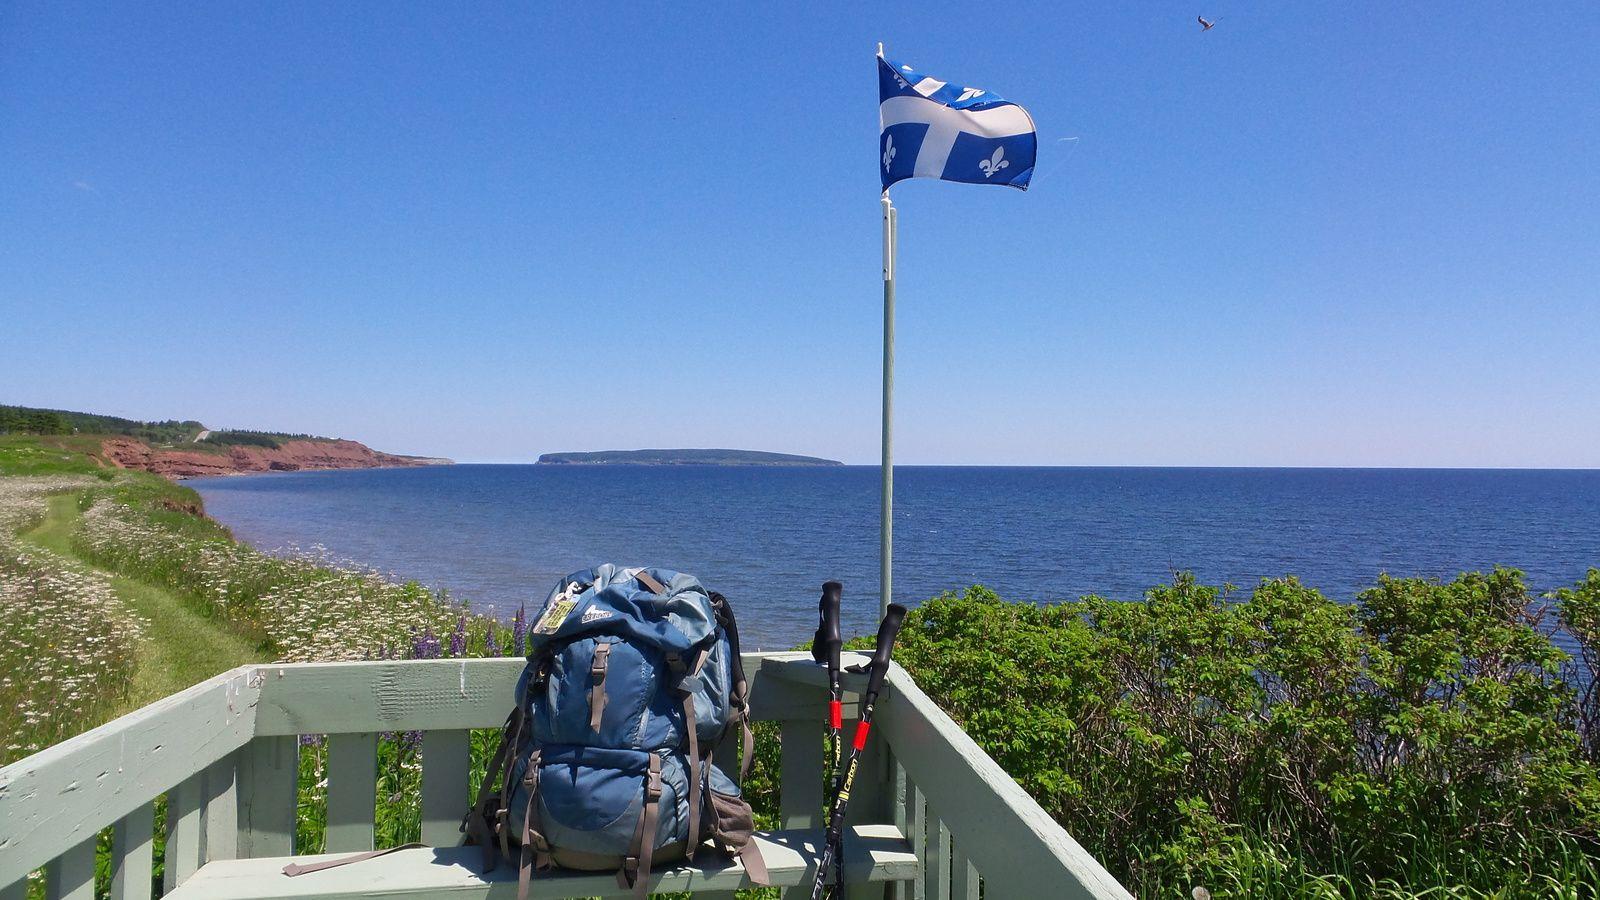 La plage de Pabos-Mills, ma tente et mon sac de 8 kilos